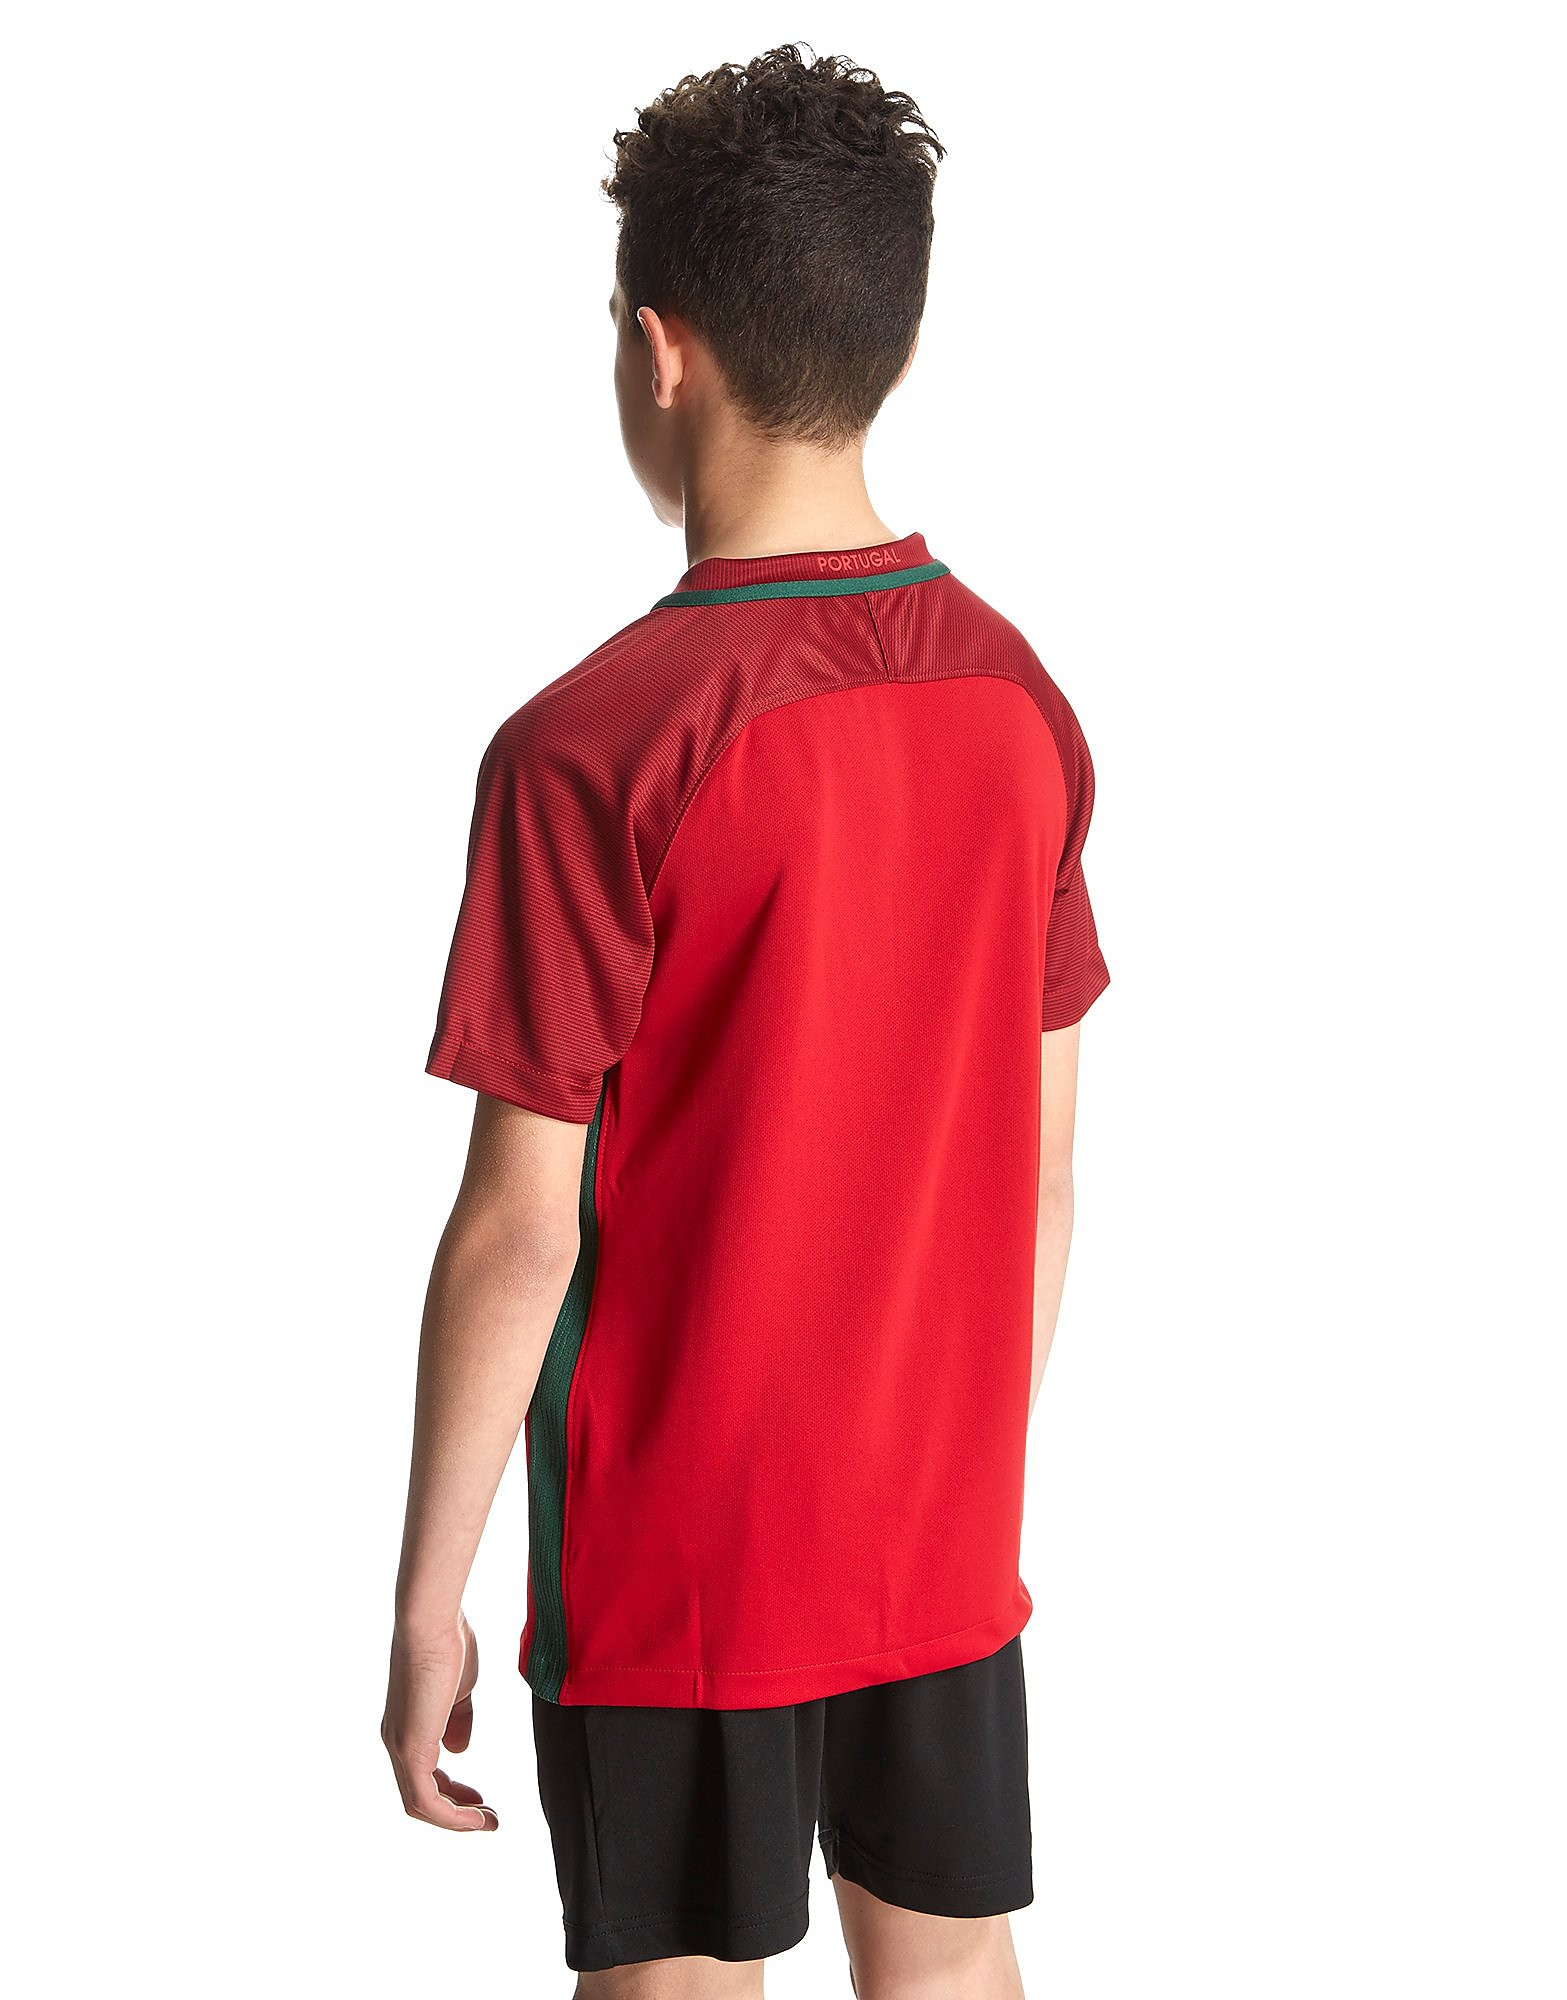 Nike Portugal Home 2016 Shirt Junior